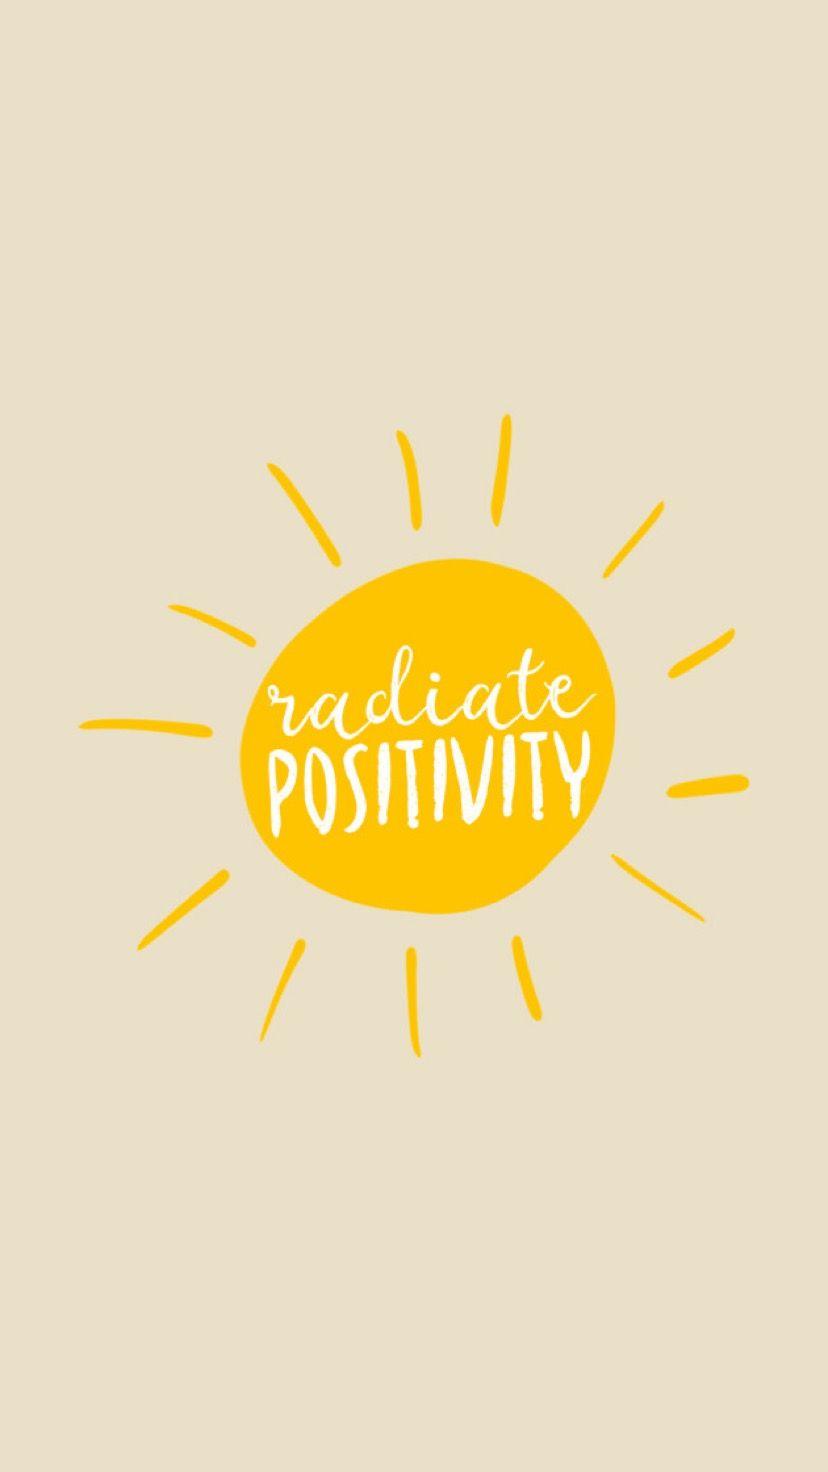 Radiate Positivity Wallpapers   Top Radiate Positivity 828x1472